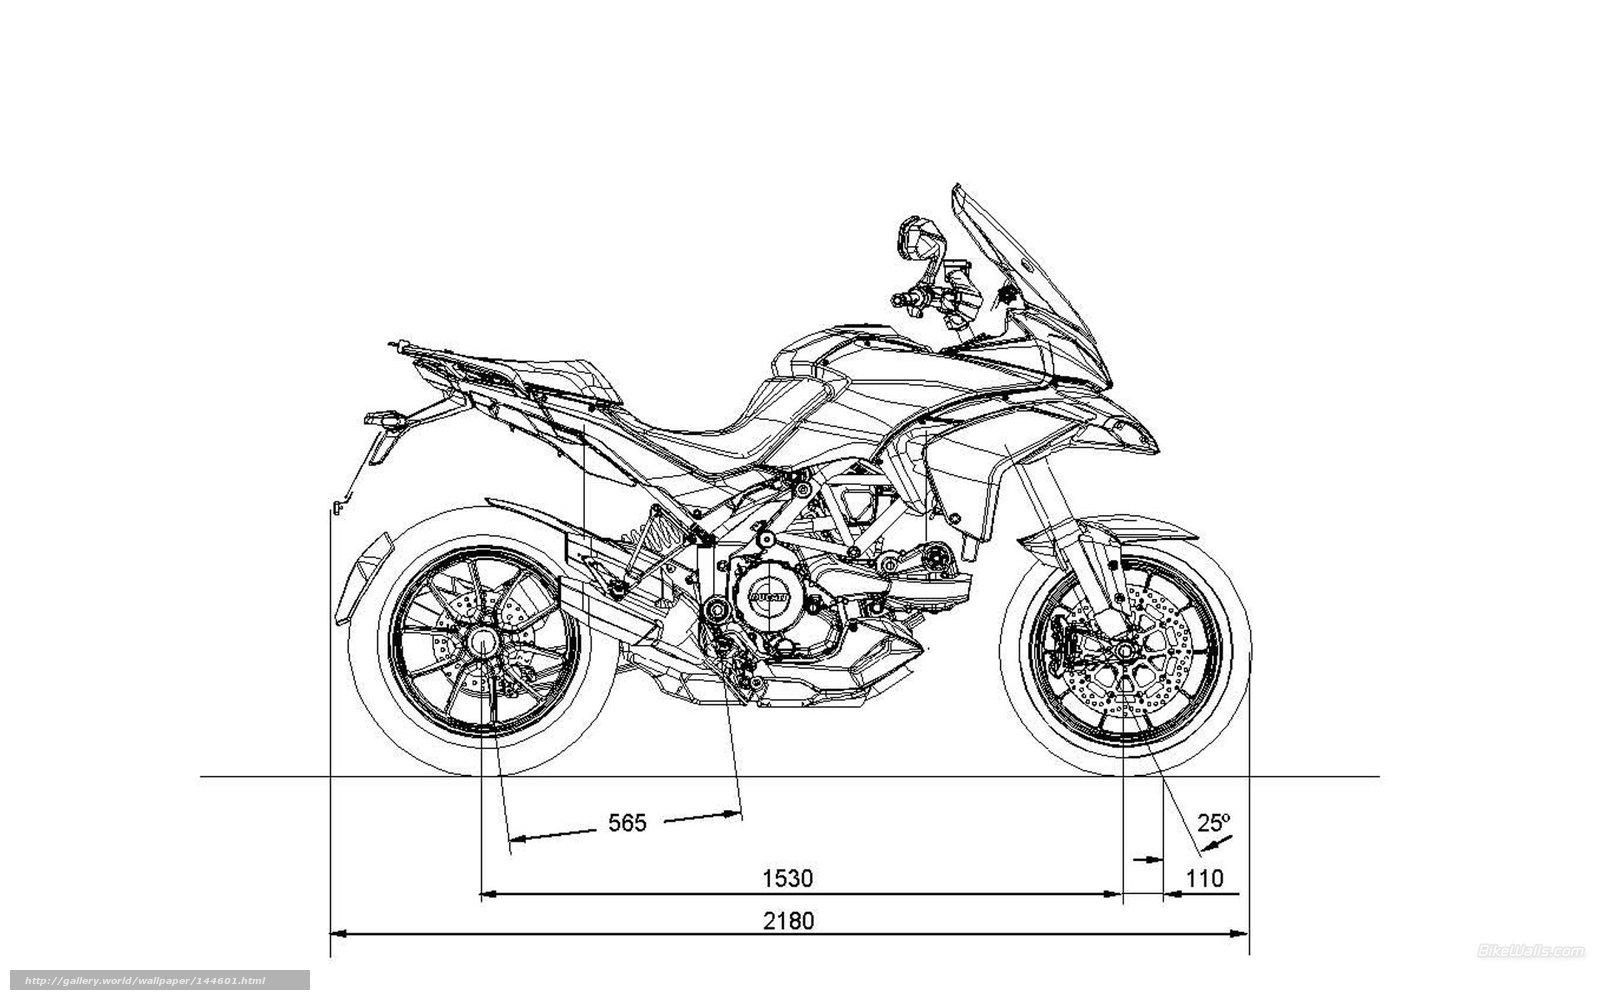 Descargar gratis Ducati, Multistrada, Multistrada 1200